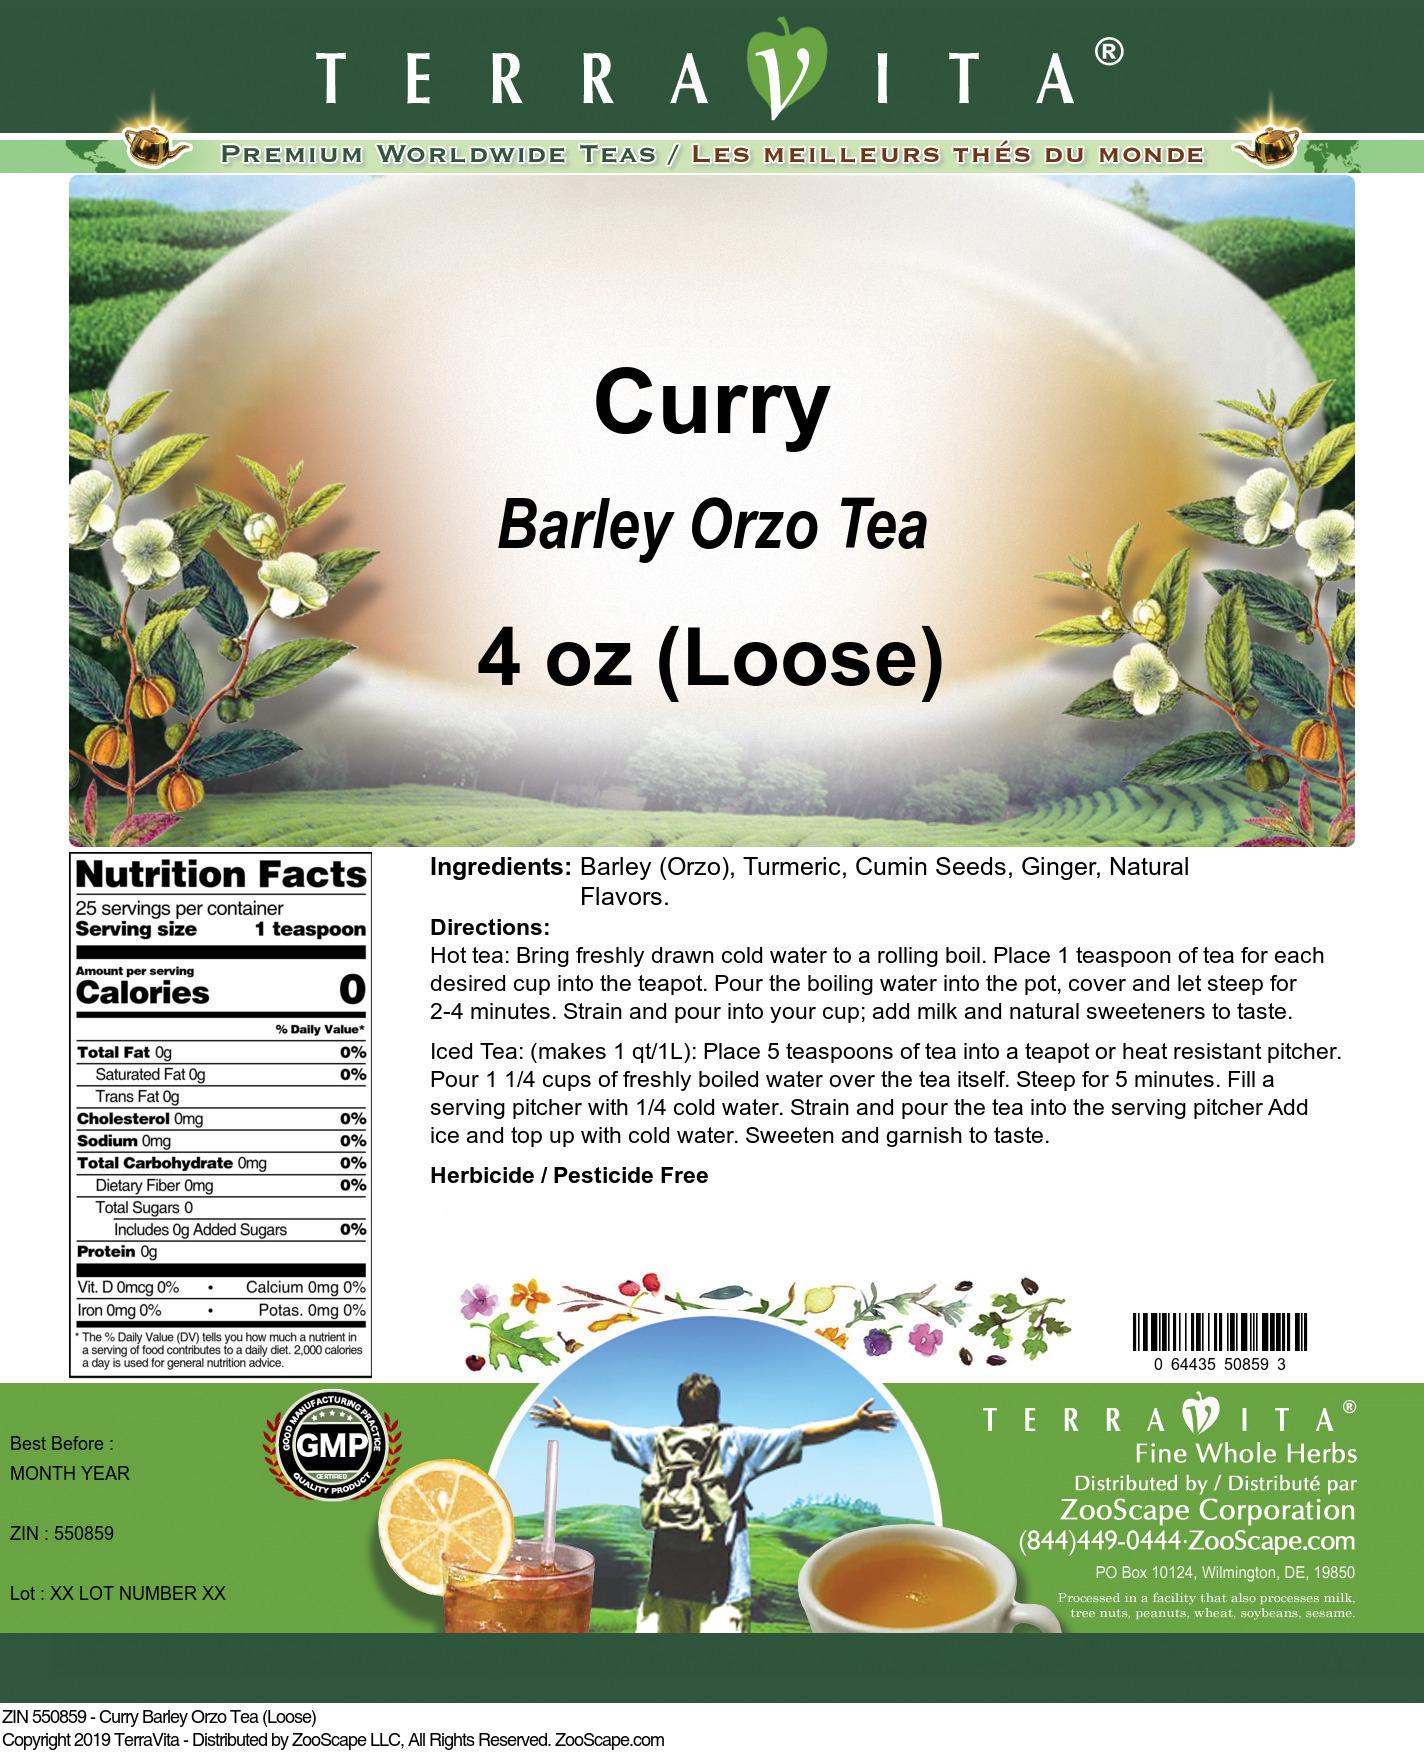 Curry Barley Orzo Tea (Loose)